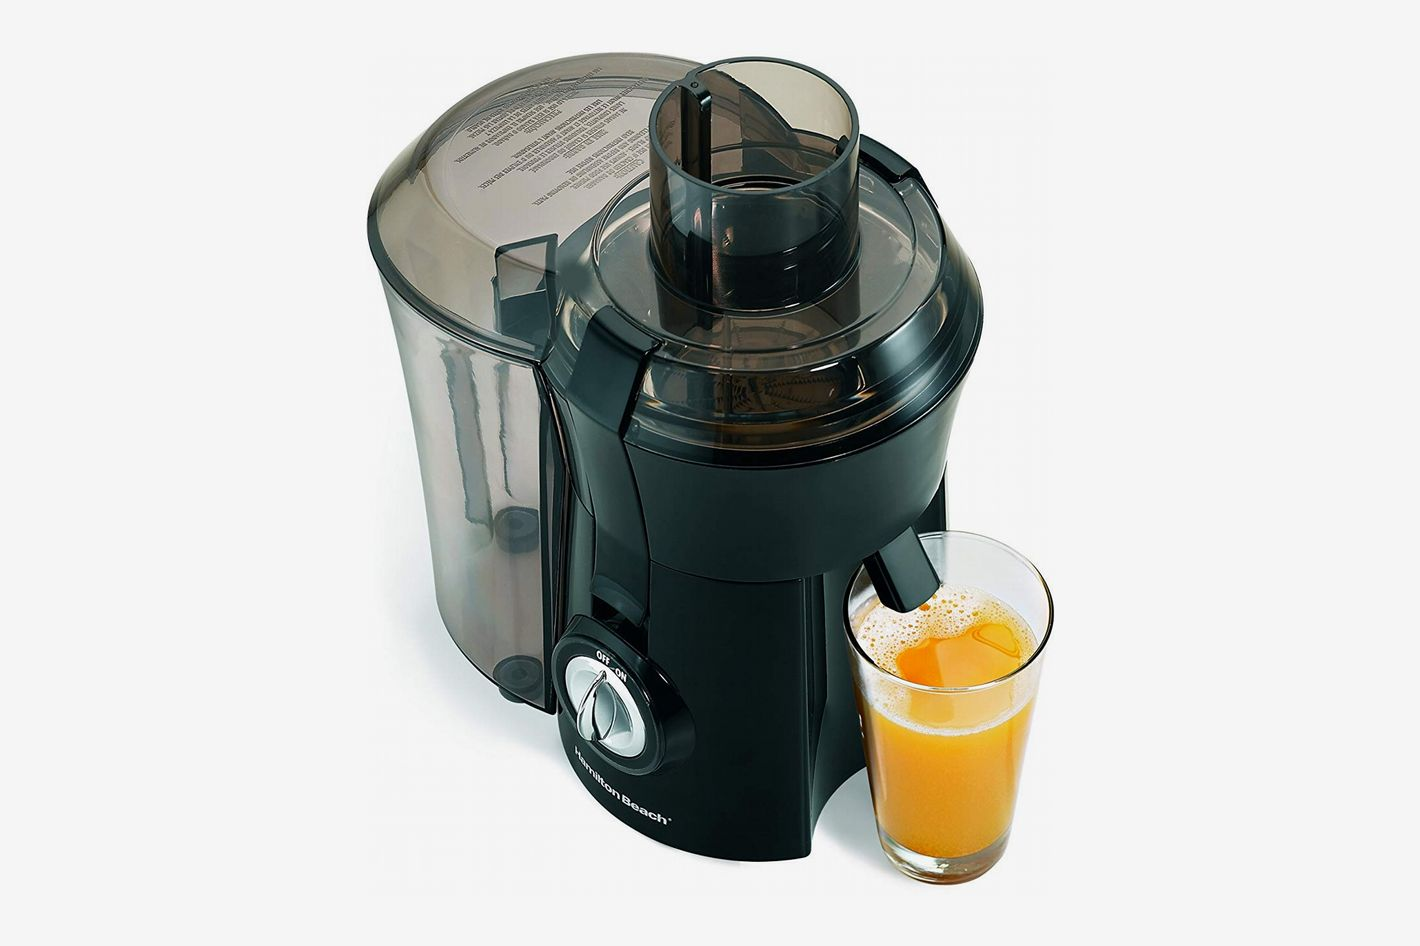 Hamilton Beach 67601A Big Mouth Juice Extractor Electric Juicer, 800 Watt, Black